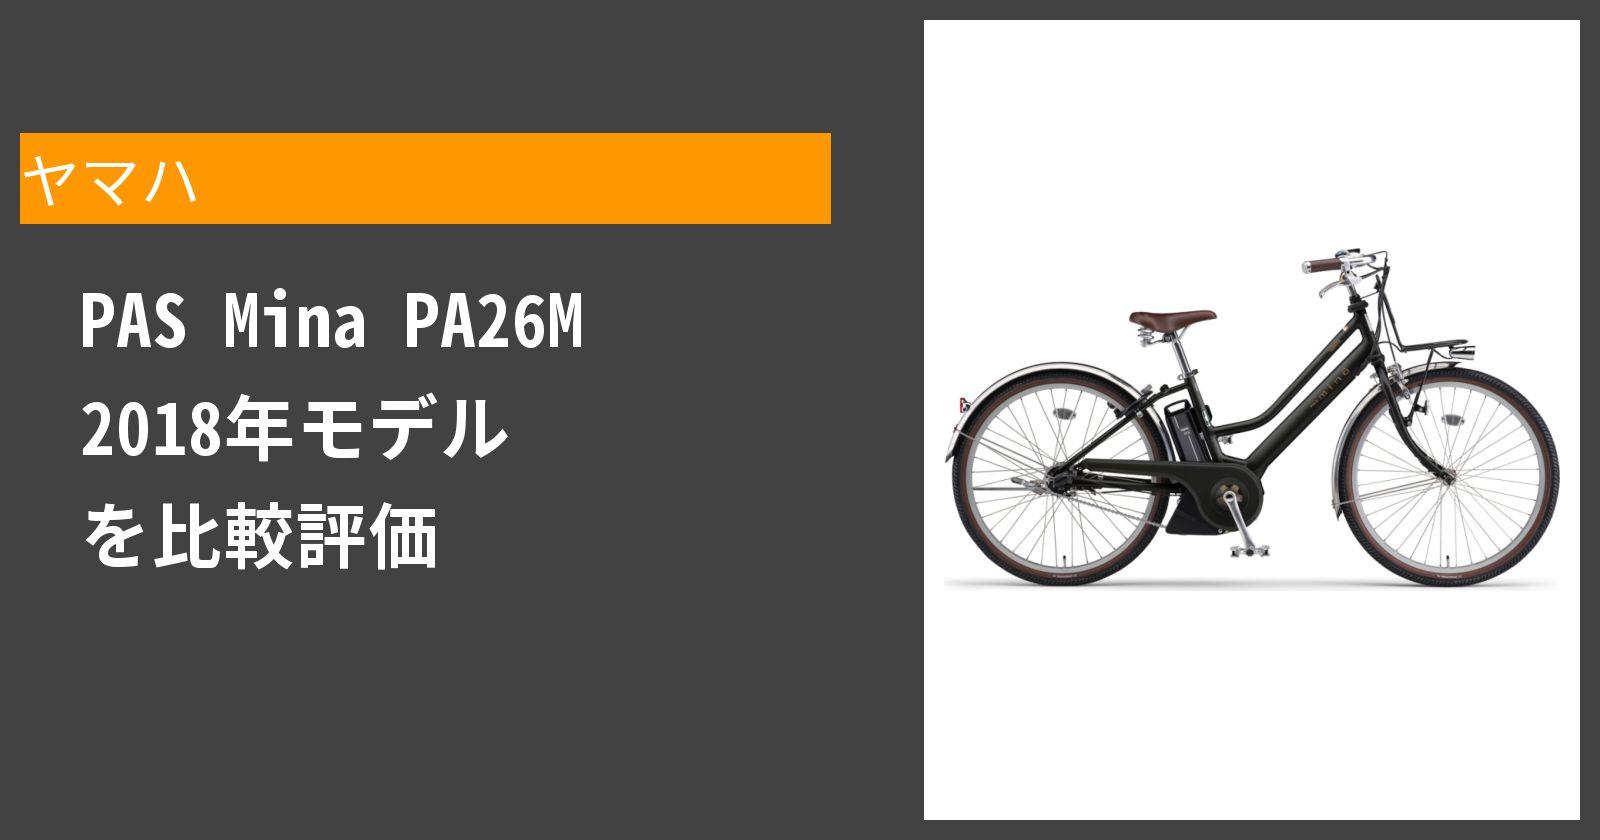 PAS Mina PA26M 2018年モデルを徹底評価